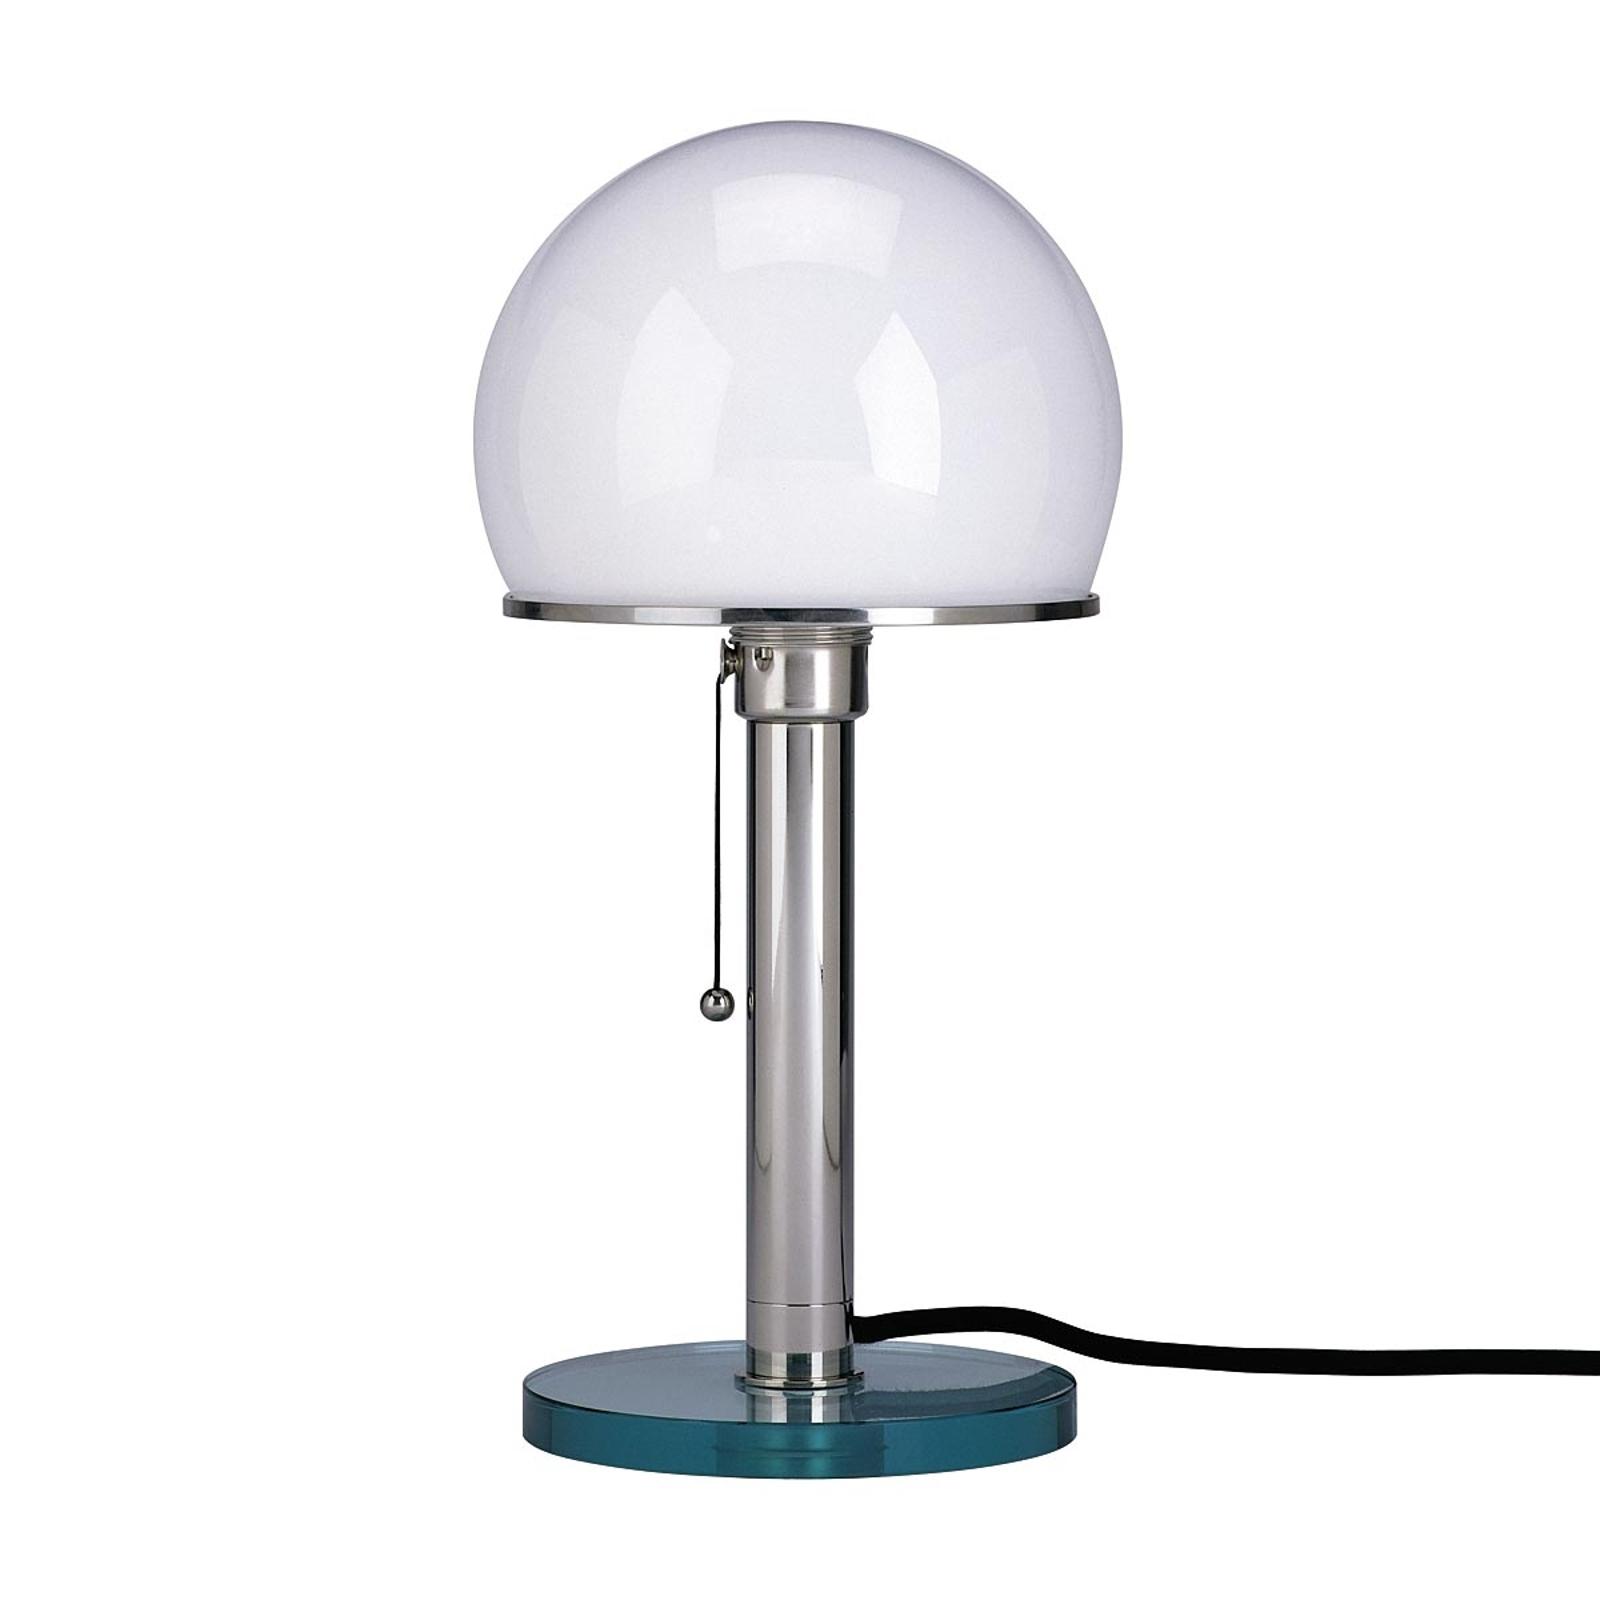 Lampe à poser Wagenfeld pied en verre socle métal